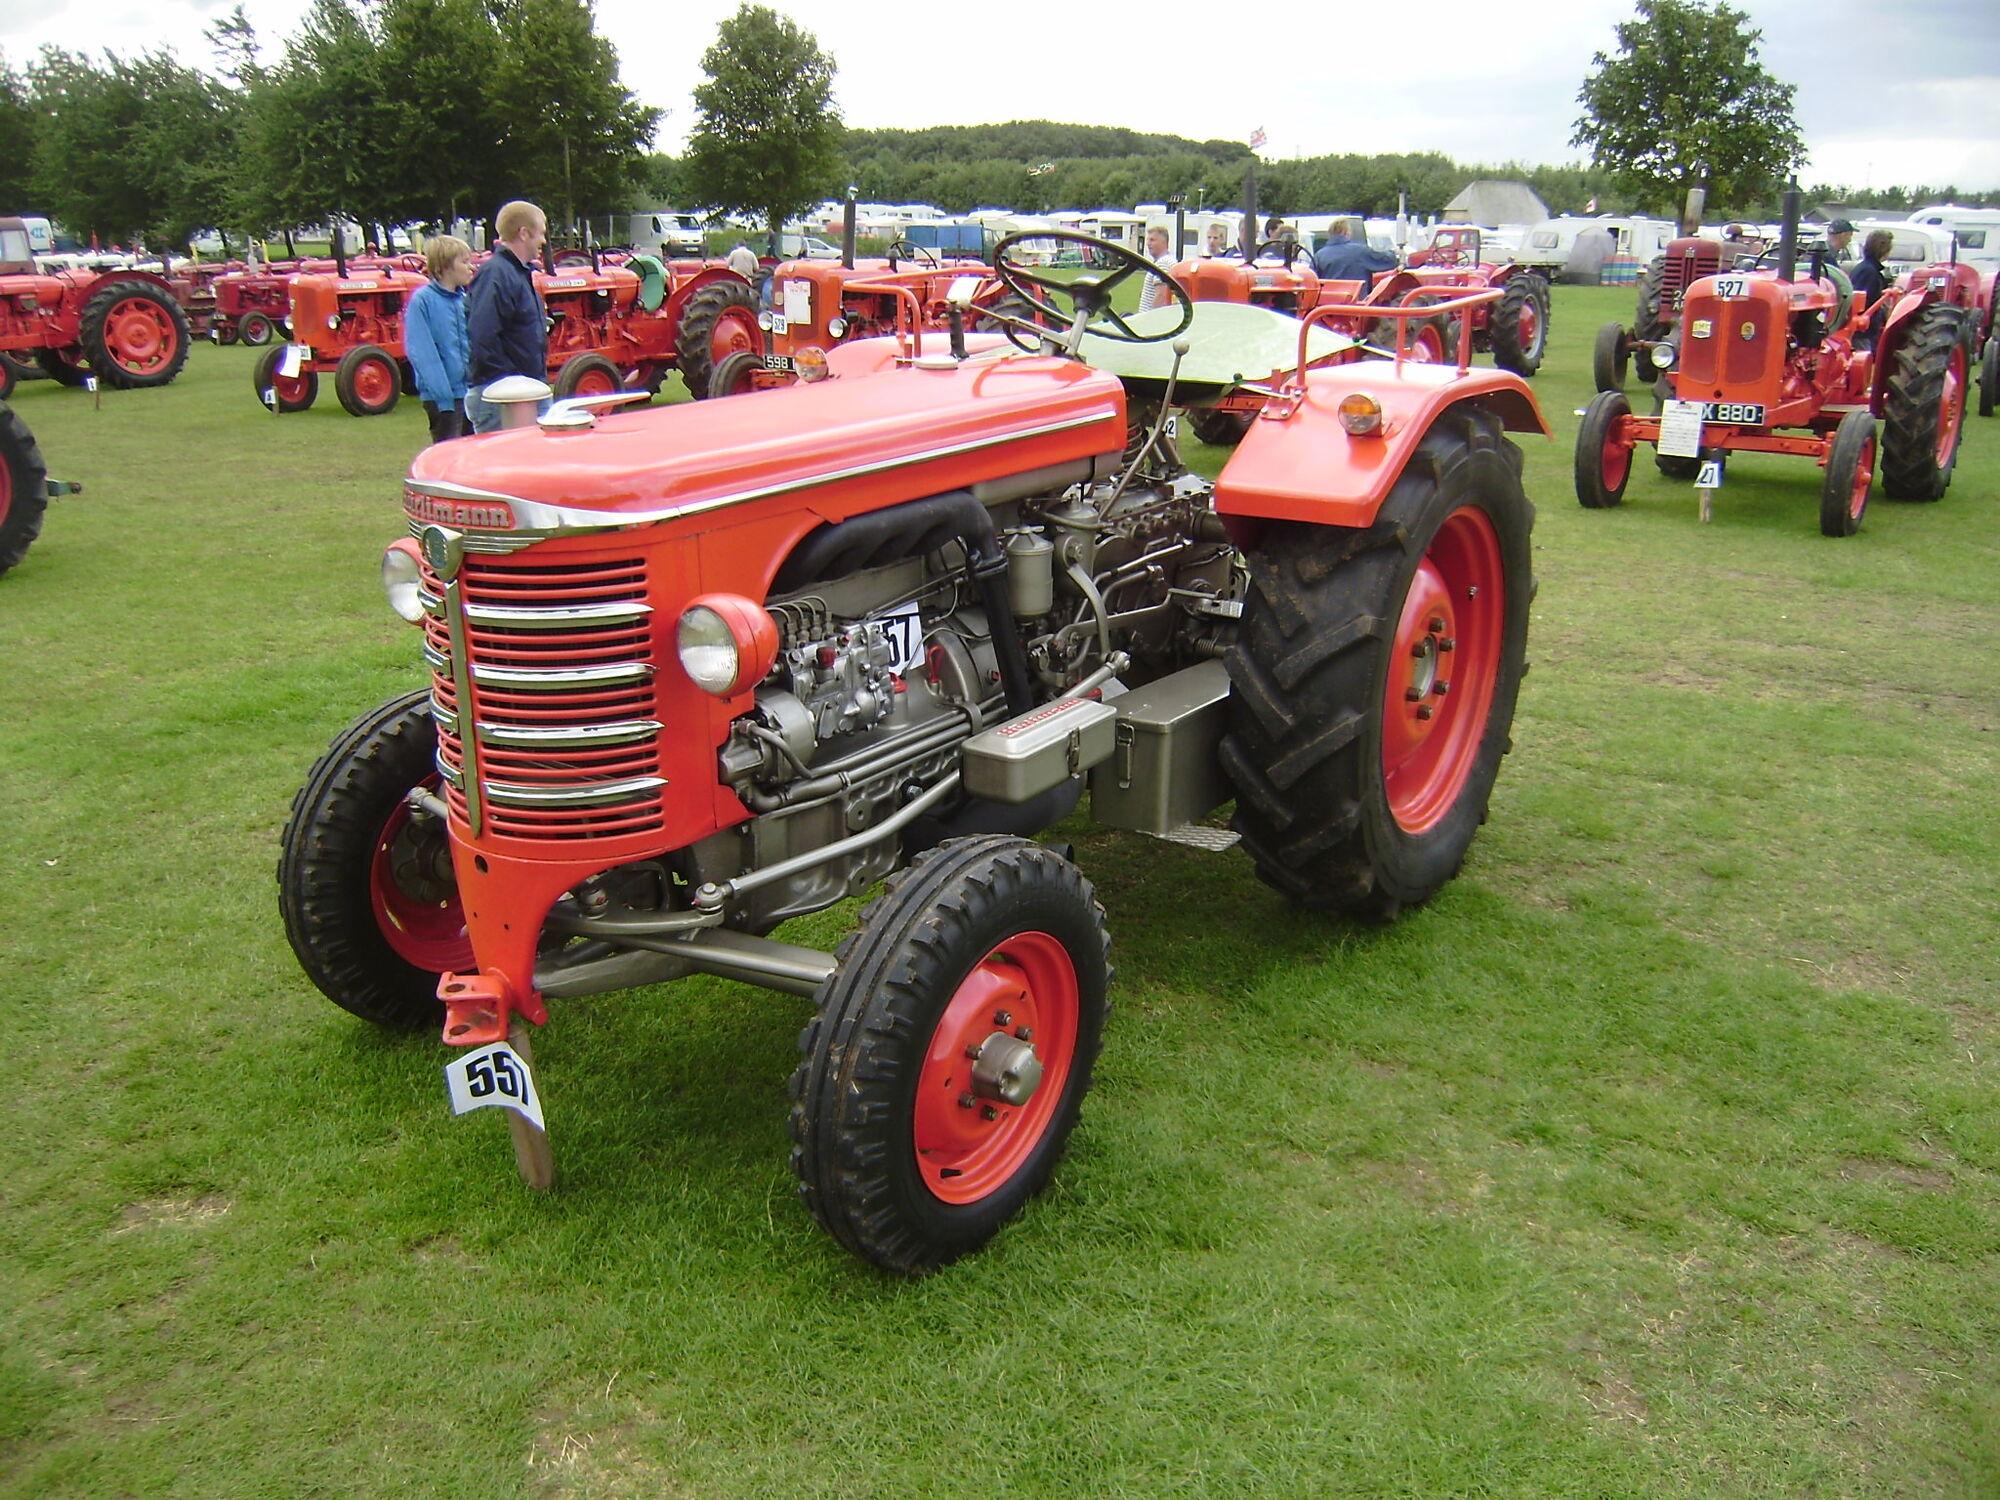 Hurlimann | Tractor & Construction Plant Wiki | FANDOM